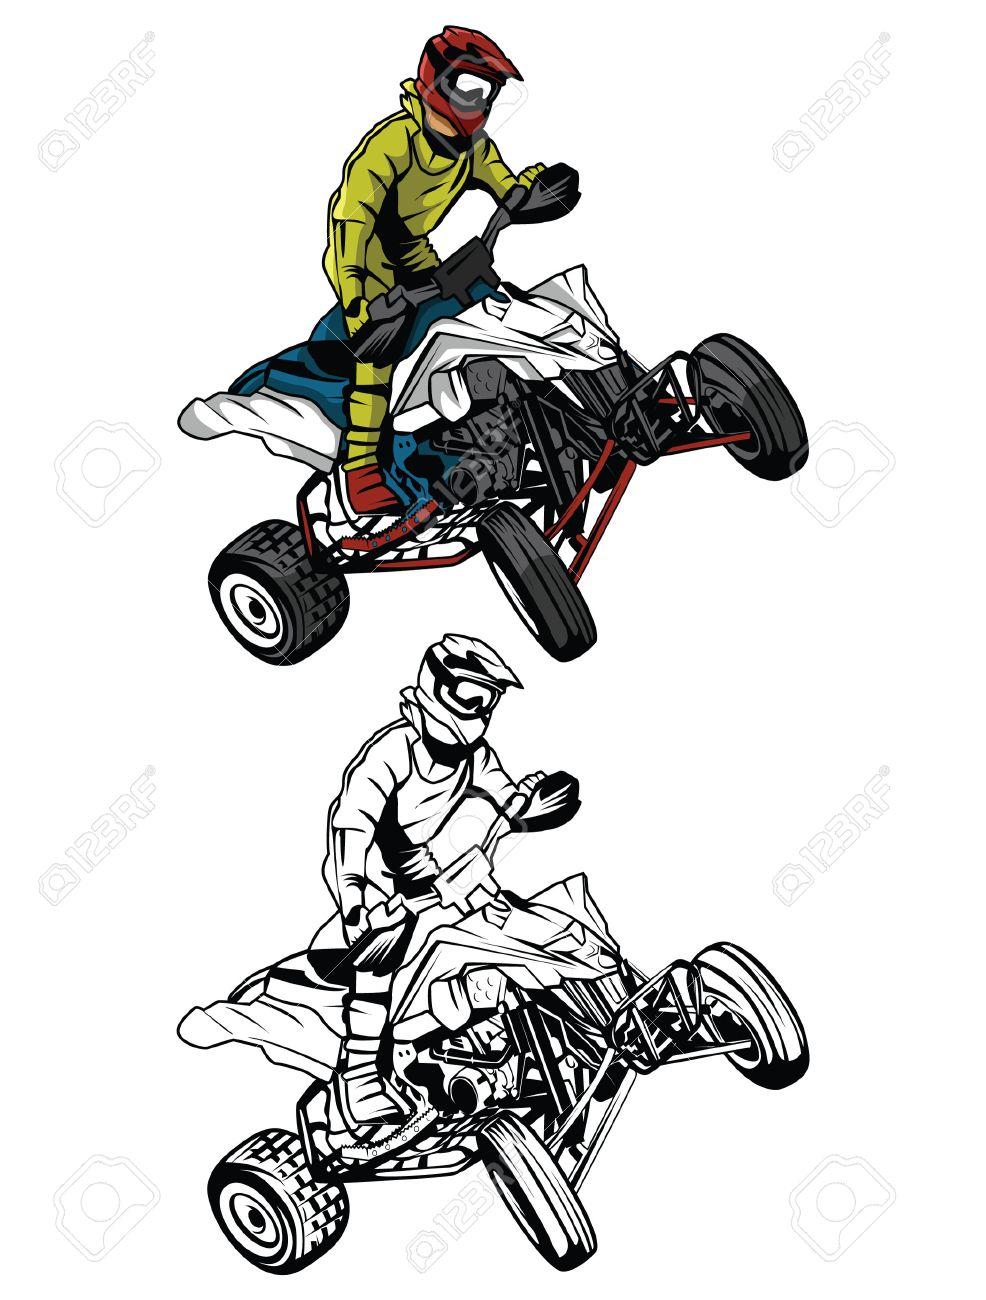 Coloring pages quad bike - Quad Bike Coloring Book Atv Moto Rider Cartoon Character Illustration